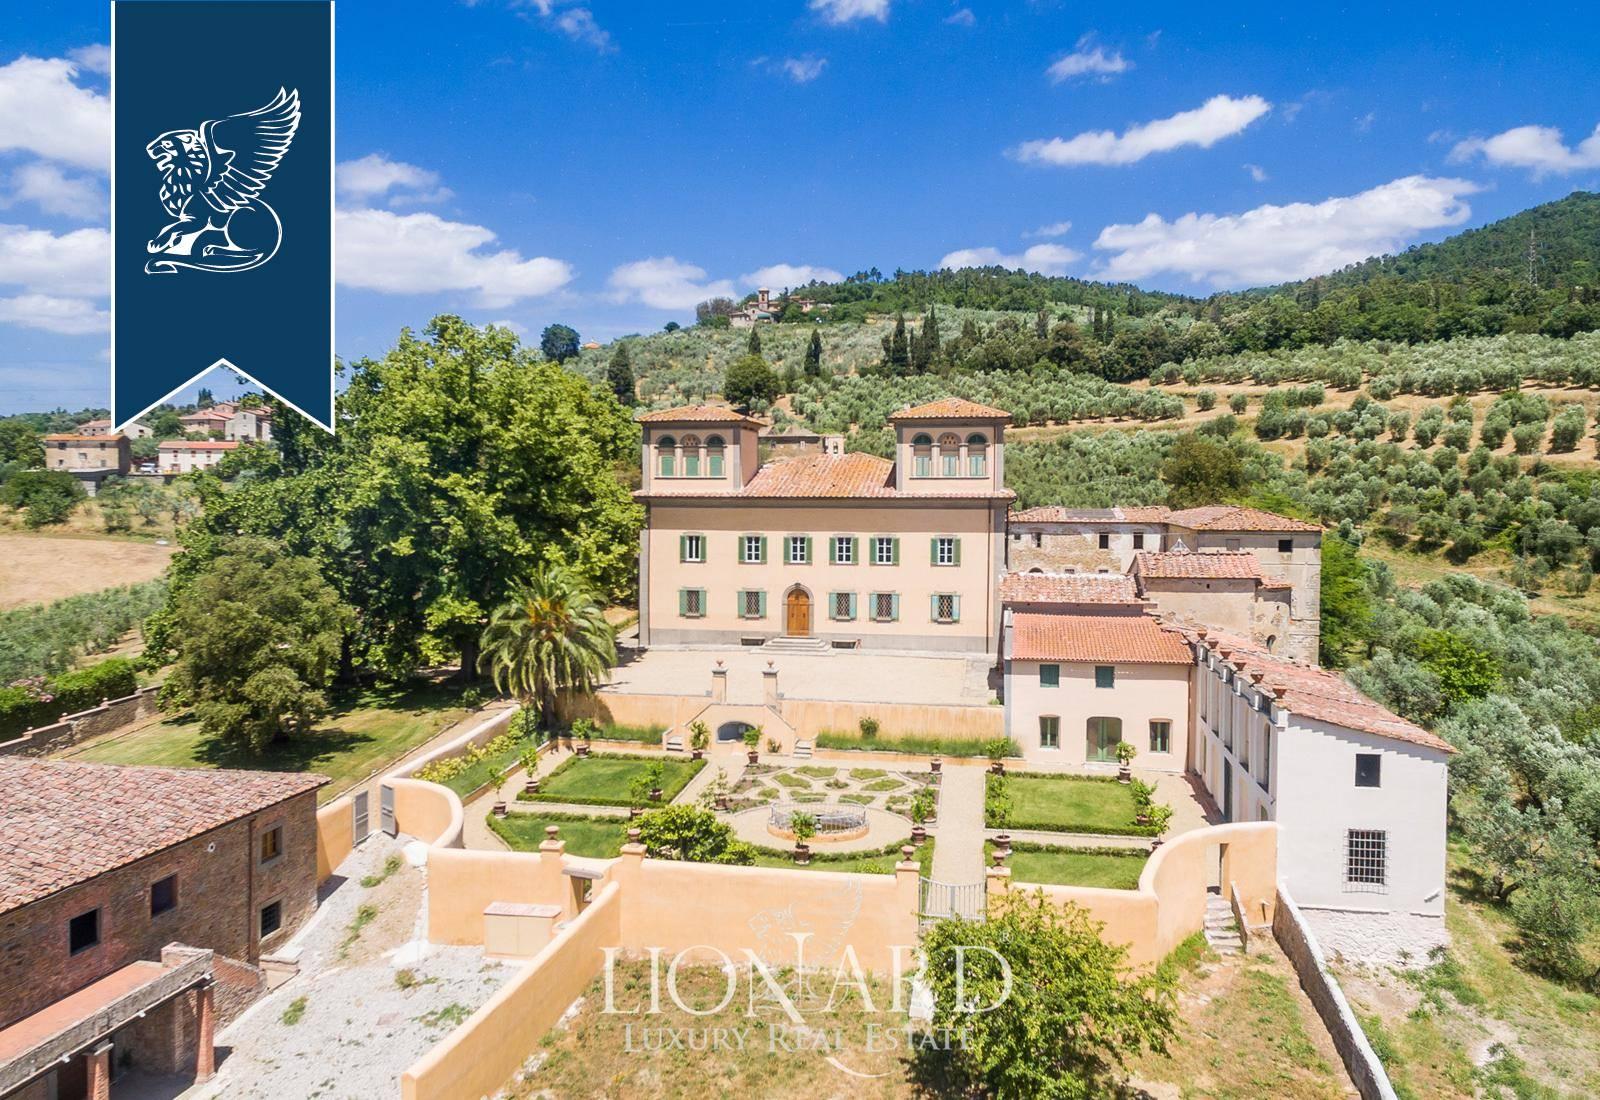 Villa in Vendita a Vinci: 0 locali, 5246 mq - Foto 7